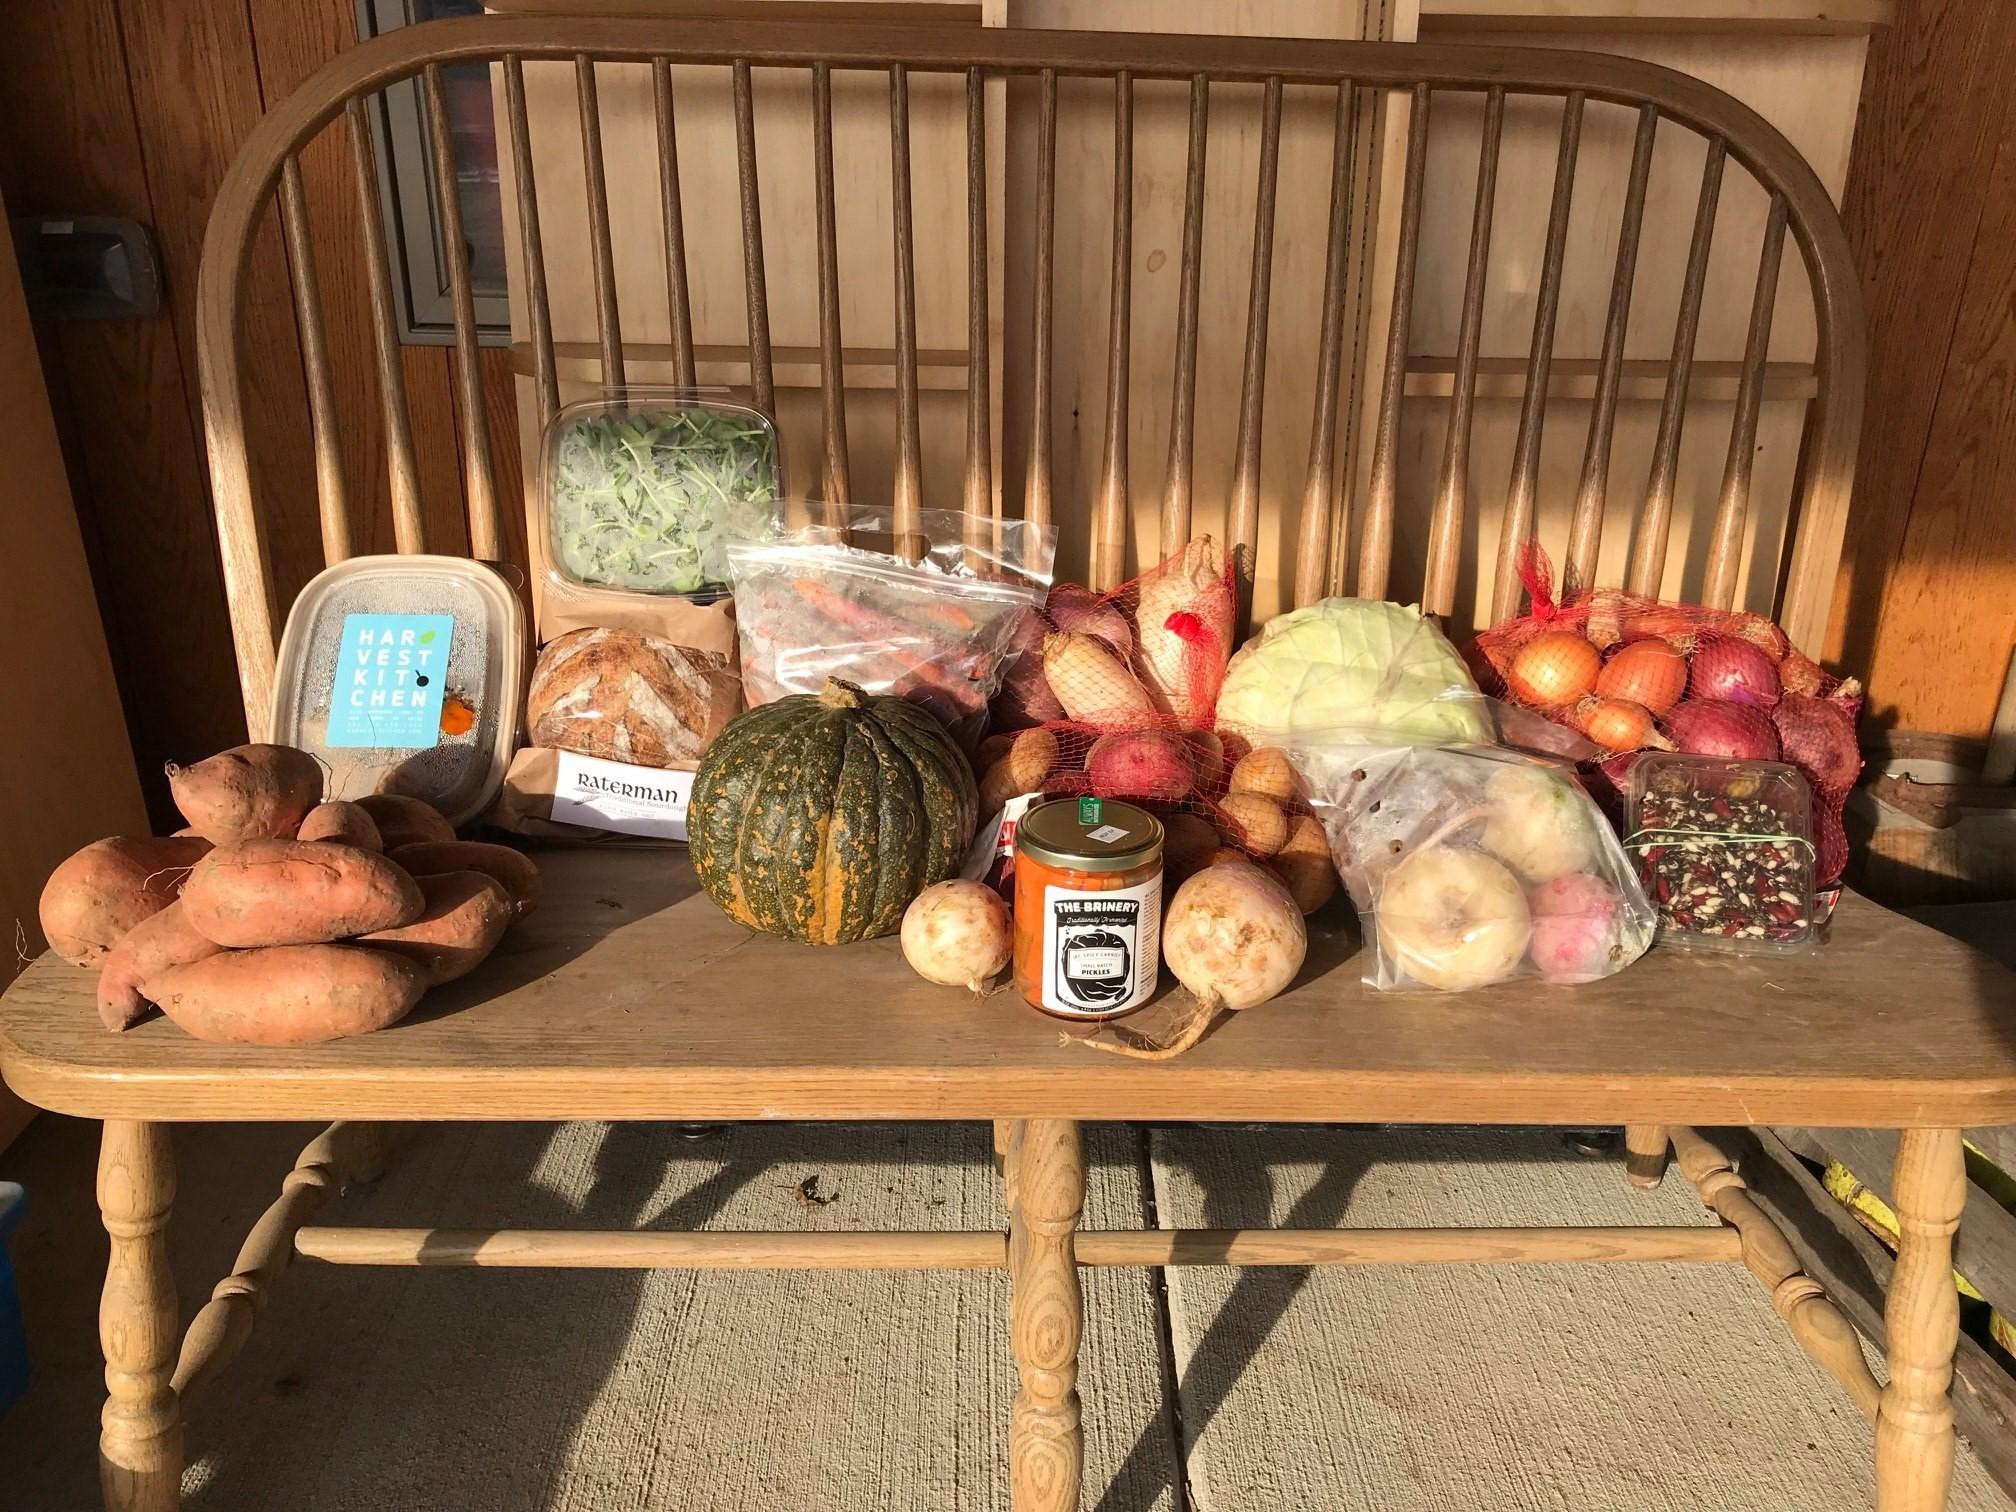 A Lifelong Devotion to Local: Washtenaw Food Hub